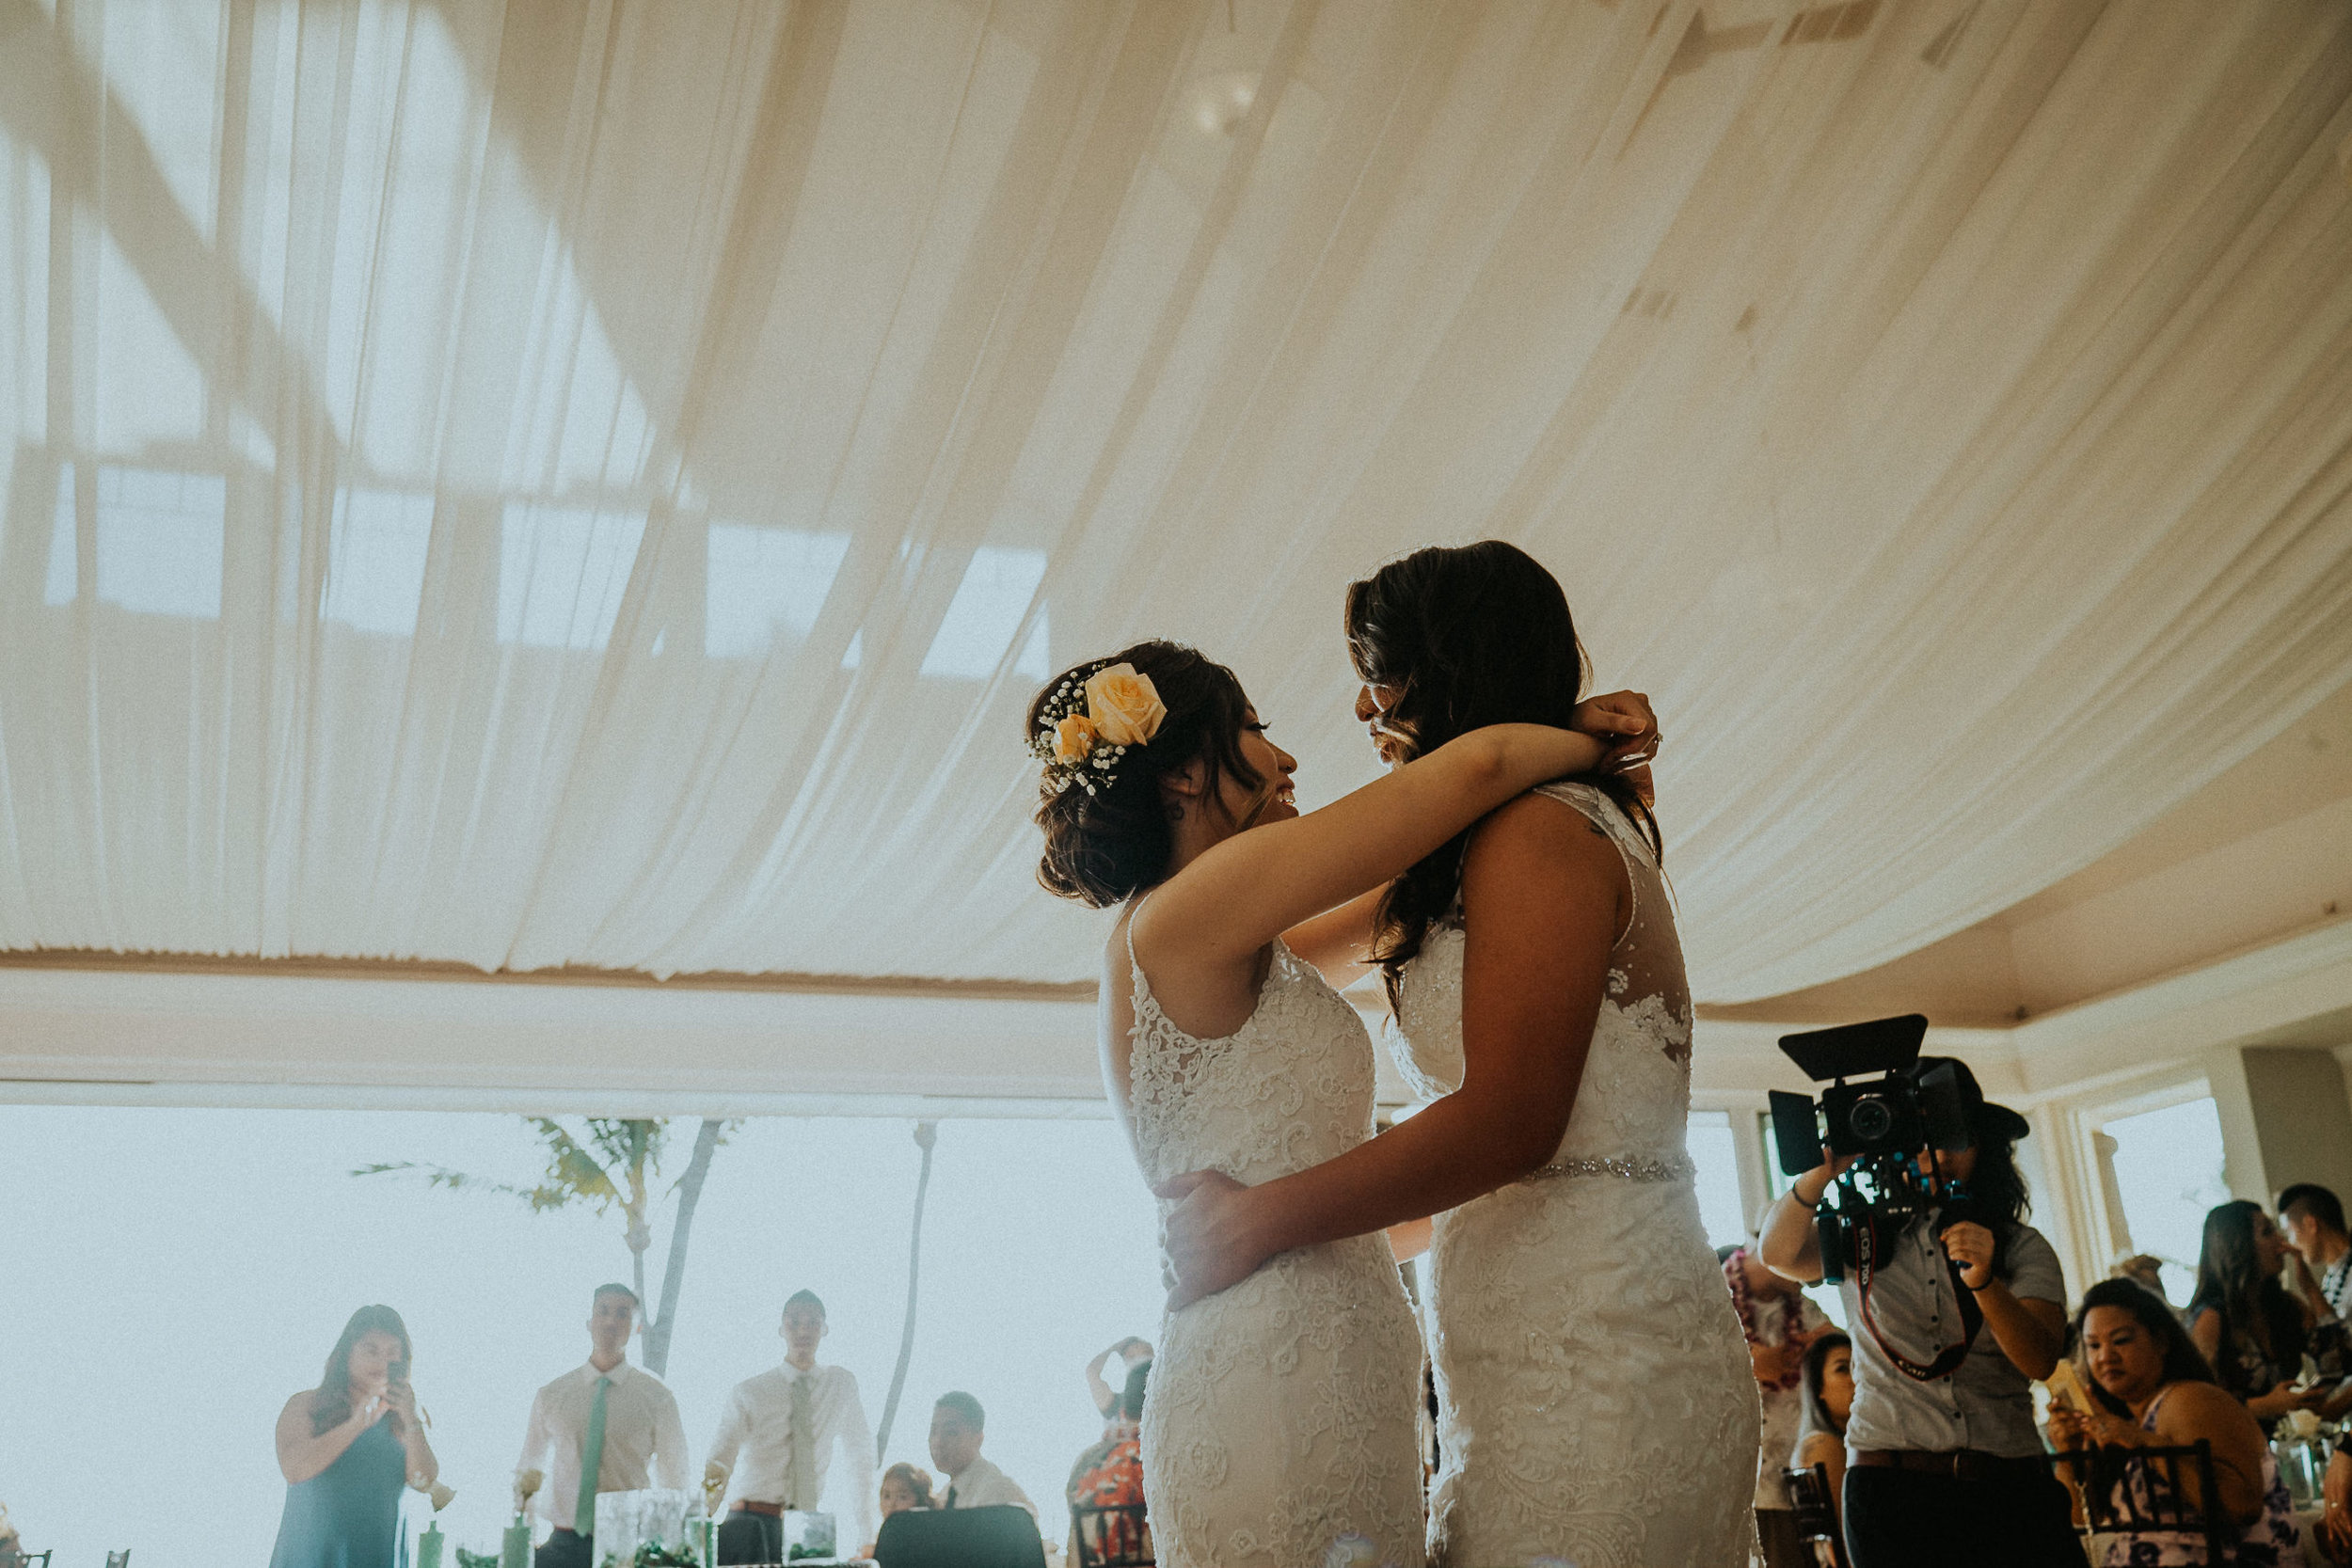 Maui_Destination_wedding_Alfred_Tang-41.jpg